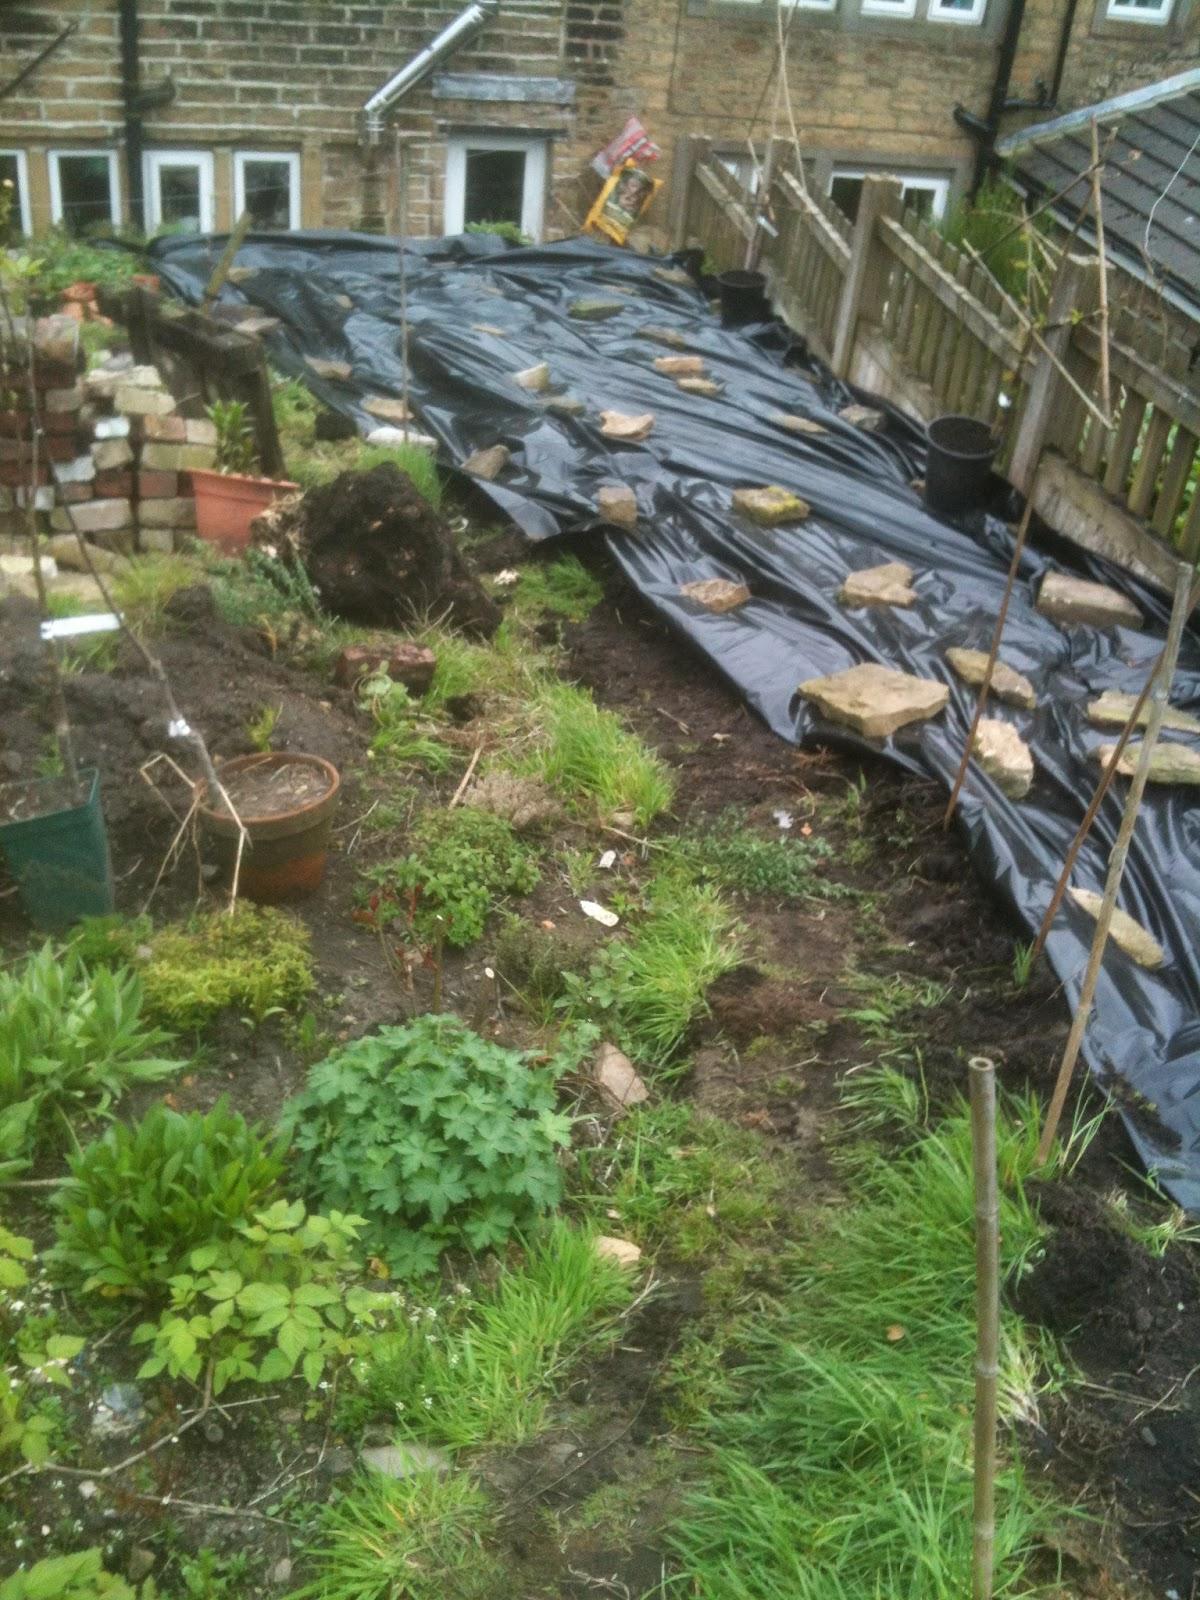 Being patients in gardening